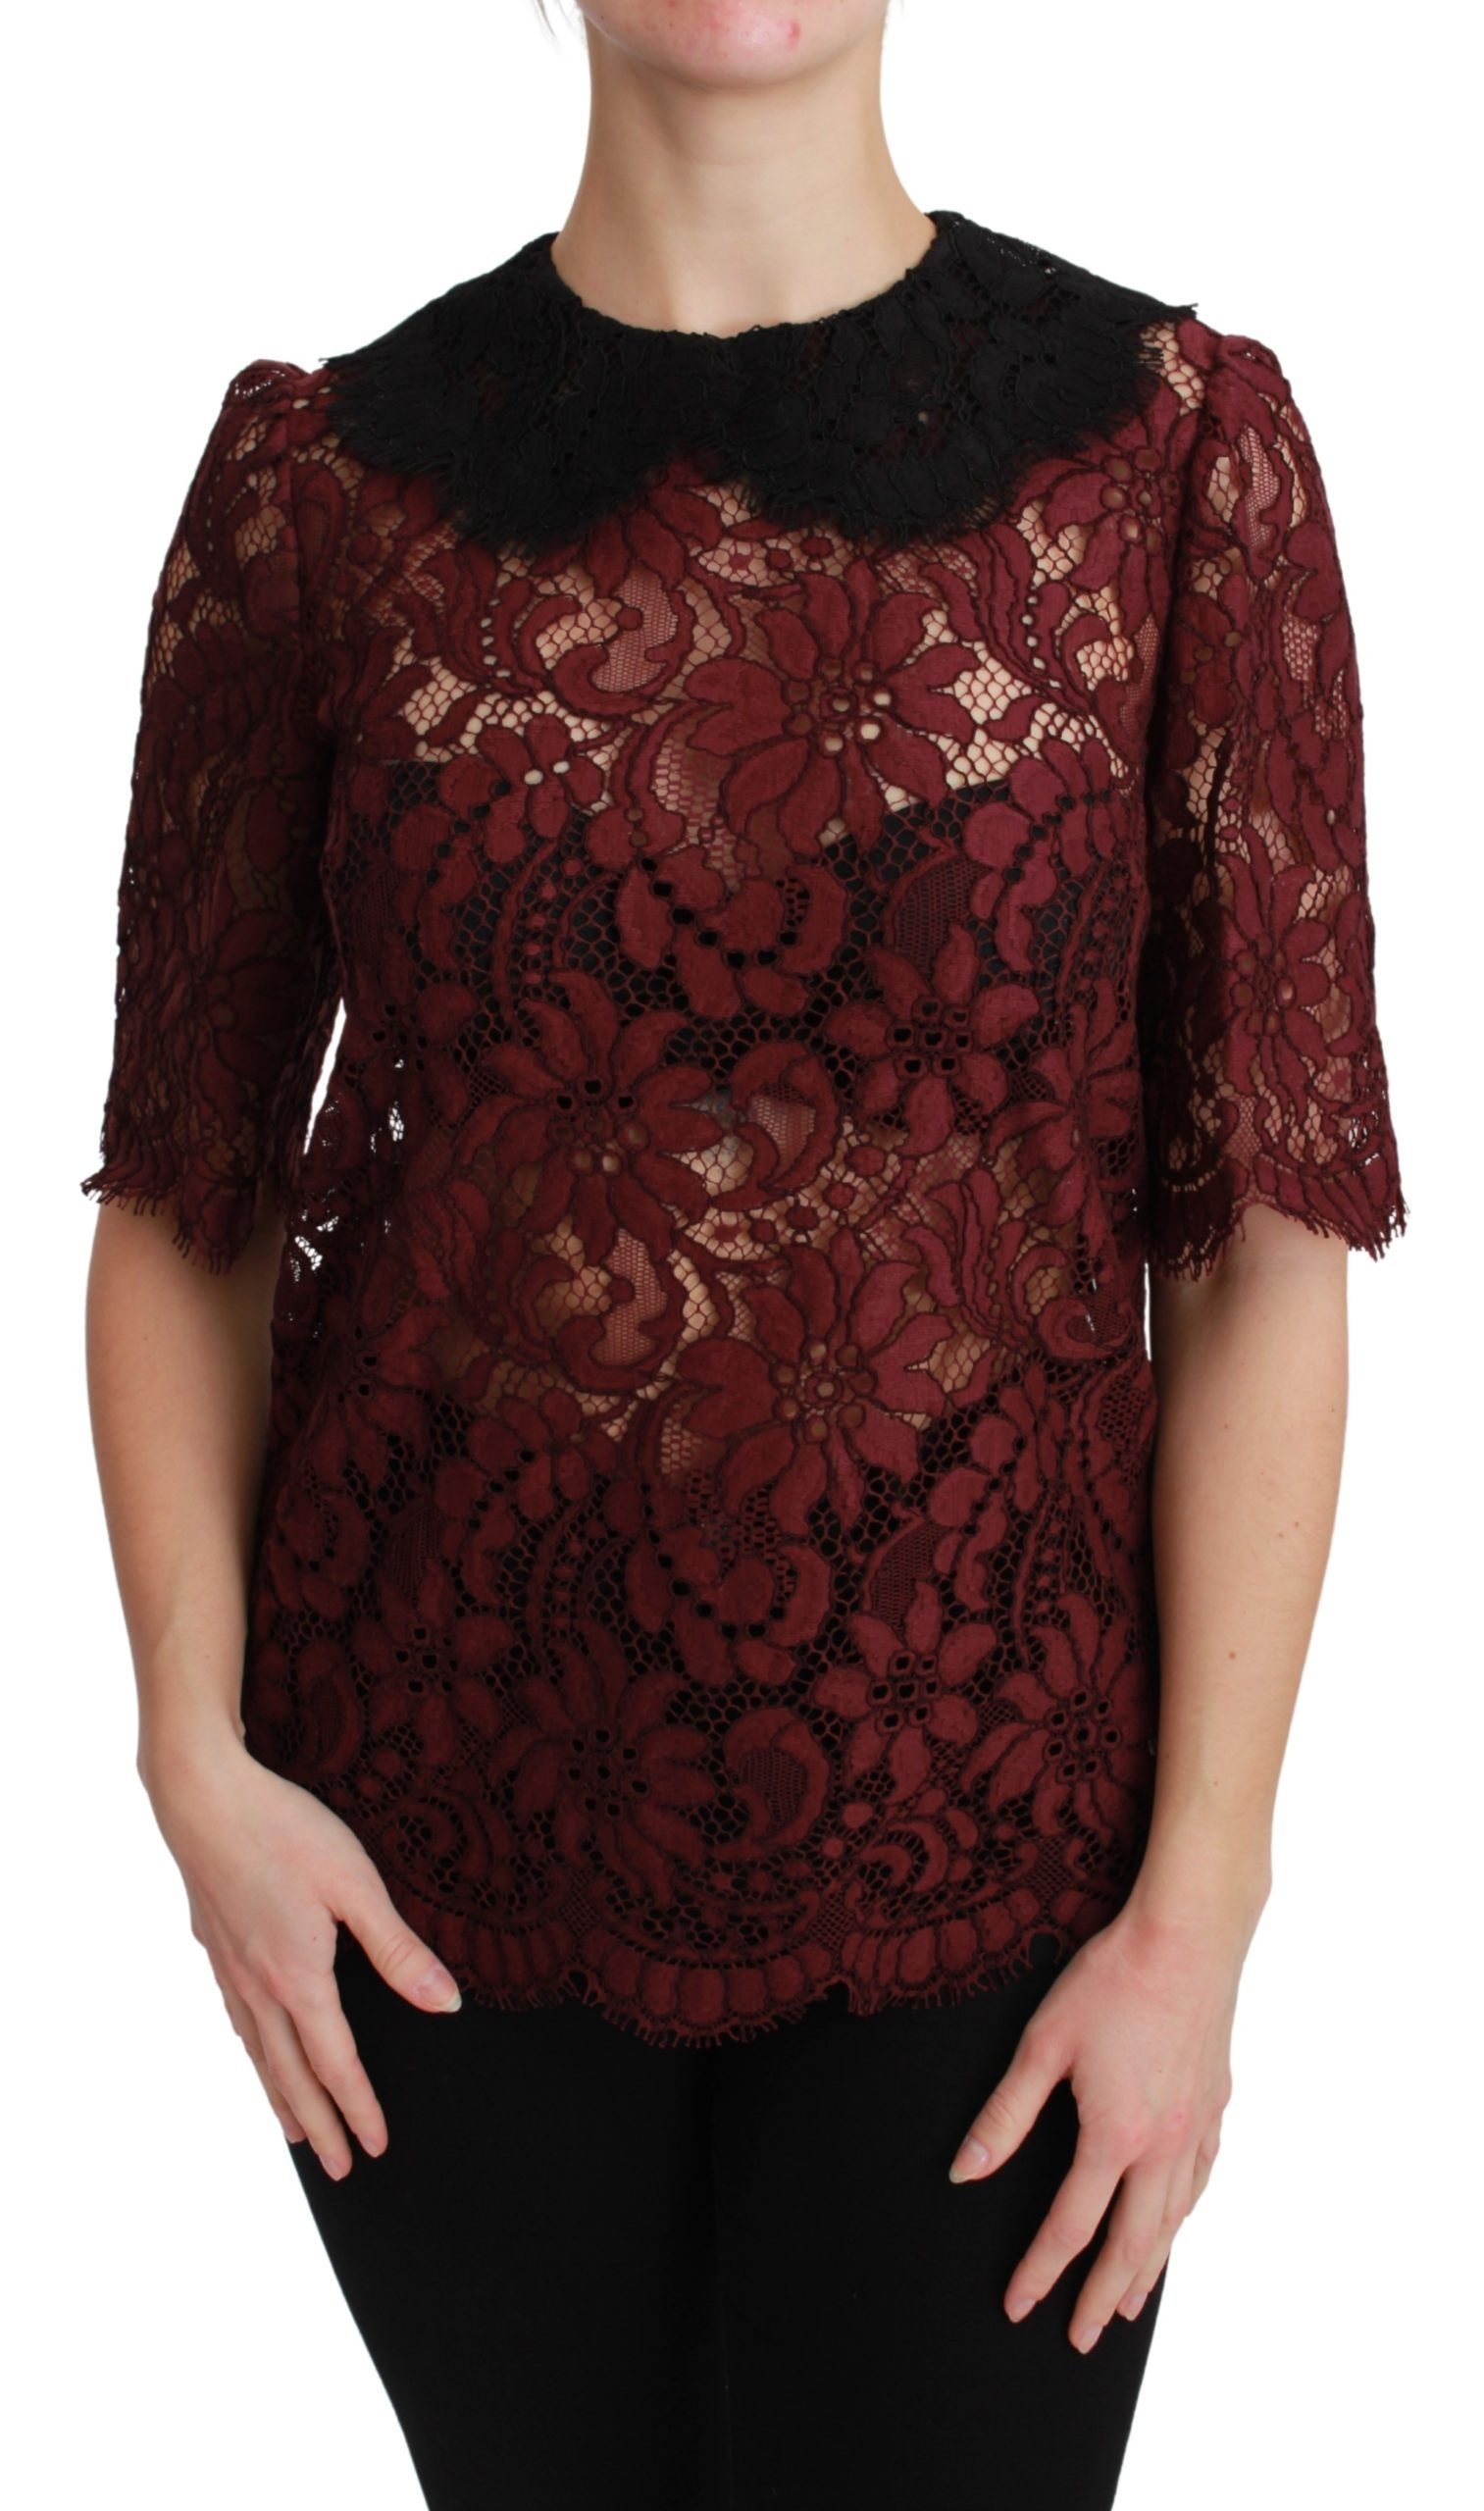 Dolce & Gabbana Women's Short Sleeve Top Maroon BGTSH2679 - IT42|M